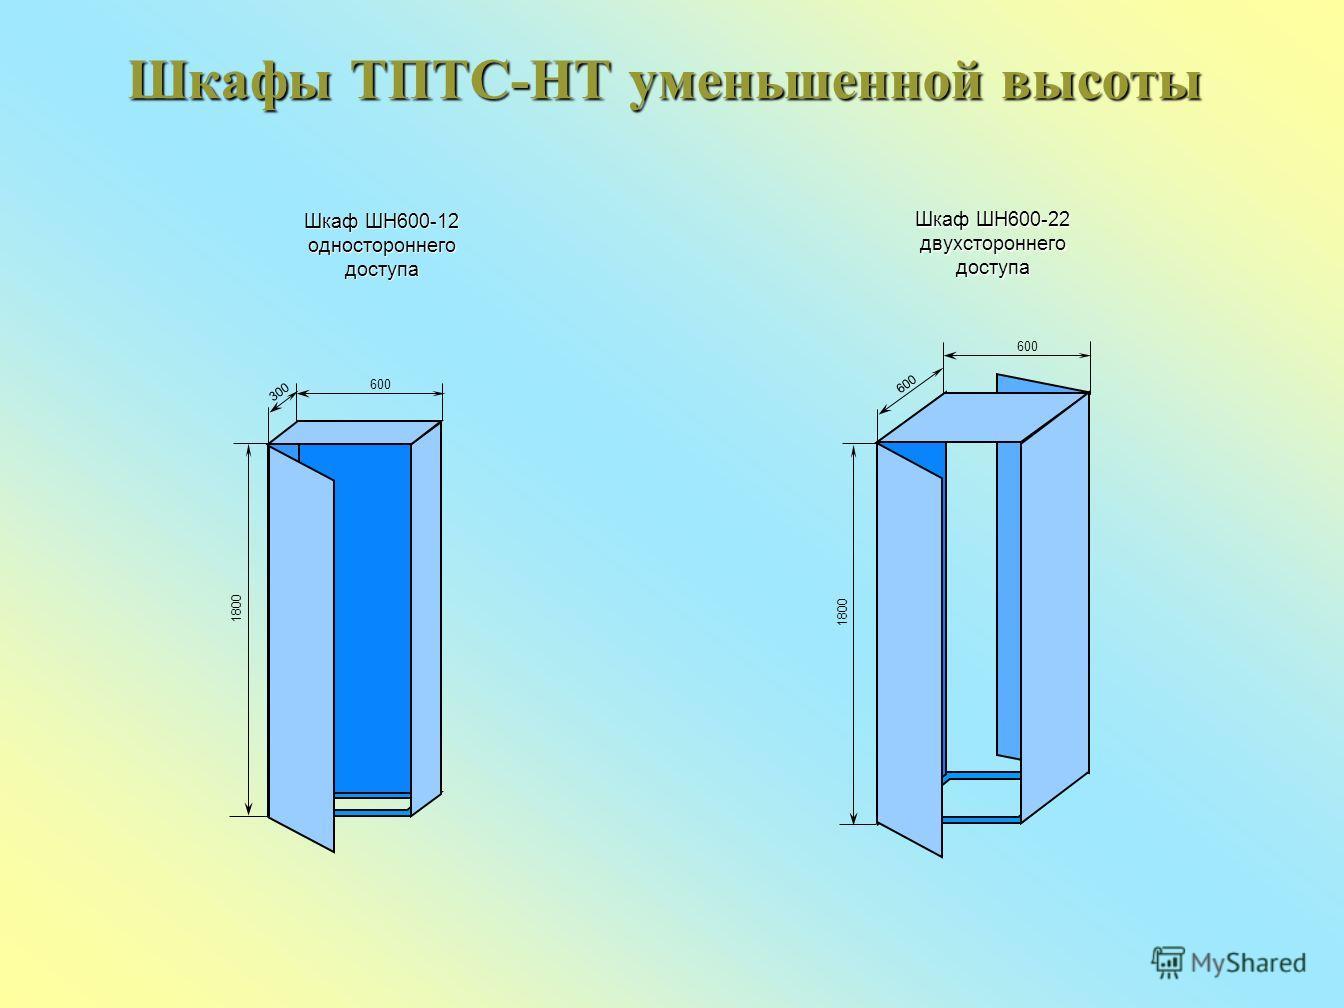 Шкафы ТПТС-НТ уменьшенной высоты 1800 600 300 Шкаф ШН600-12 одностороннего доступа Шкаф ШН600-22 двухстороннего доступа 1800 600